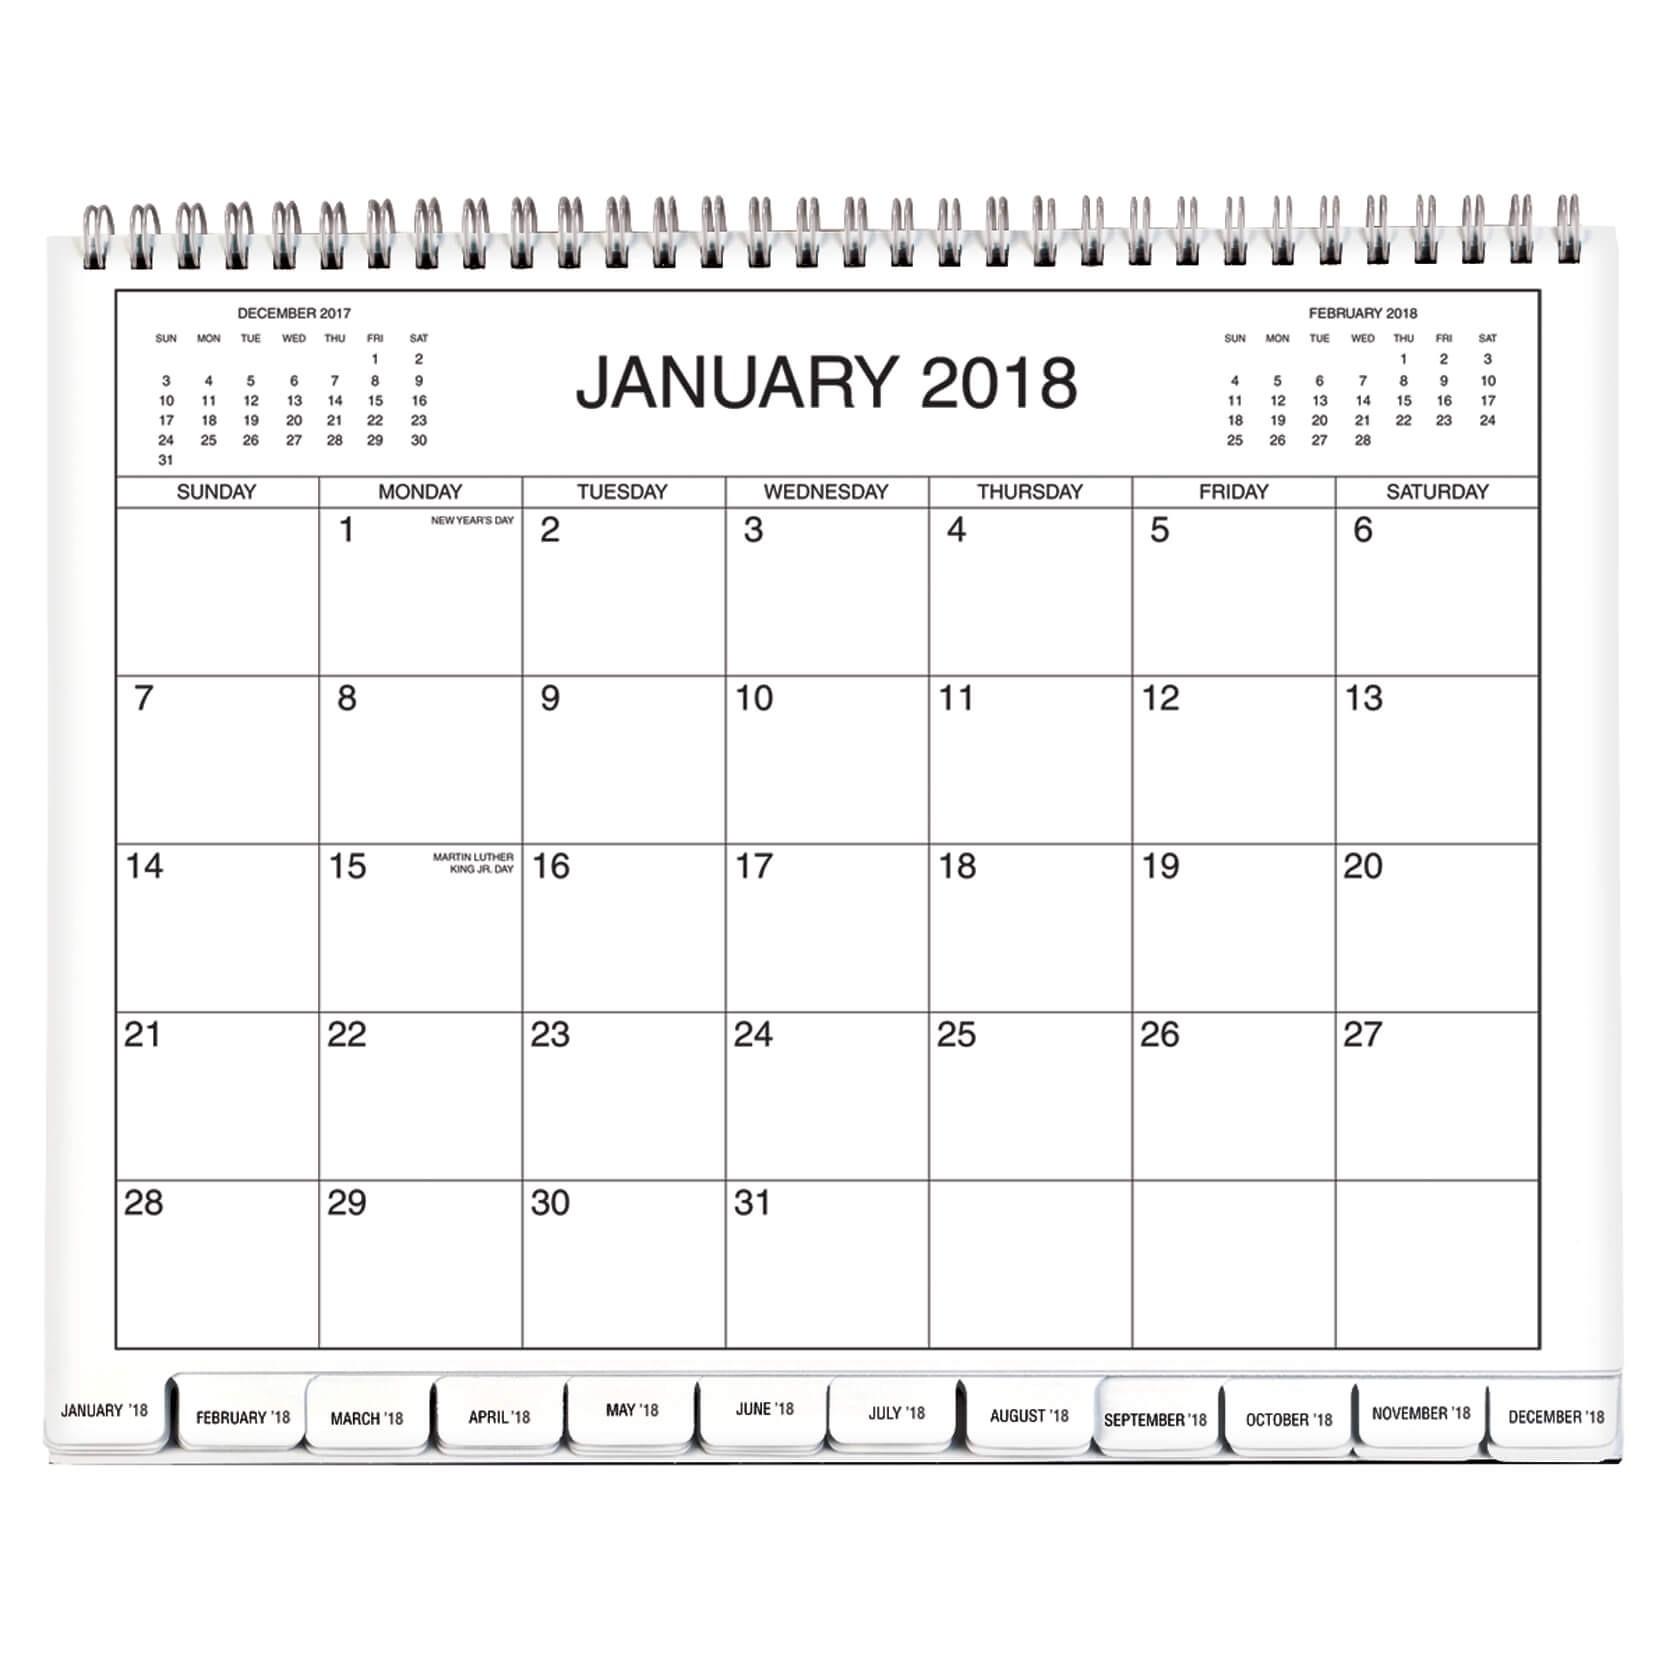 5 Year Calendar 2018-2019-2020-2021-2022 - Monthly Calendar  Calendar To Write On 2020